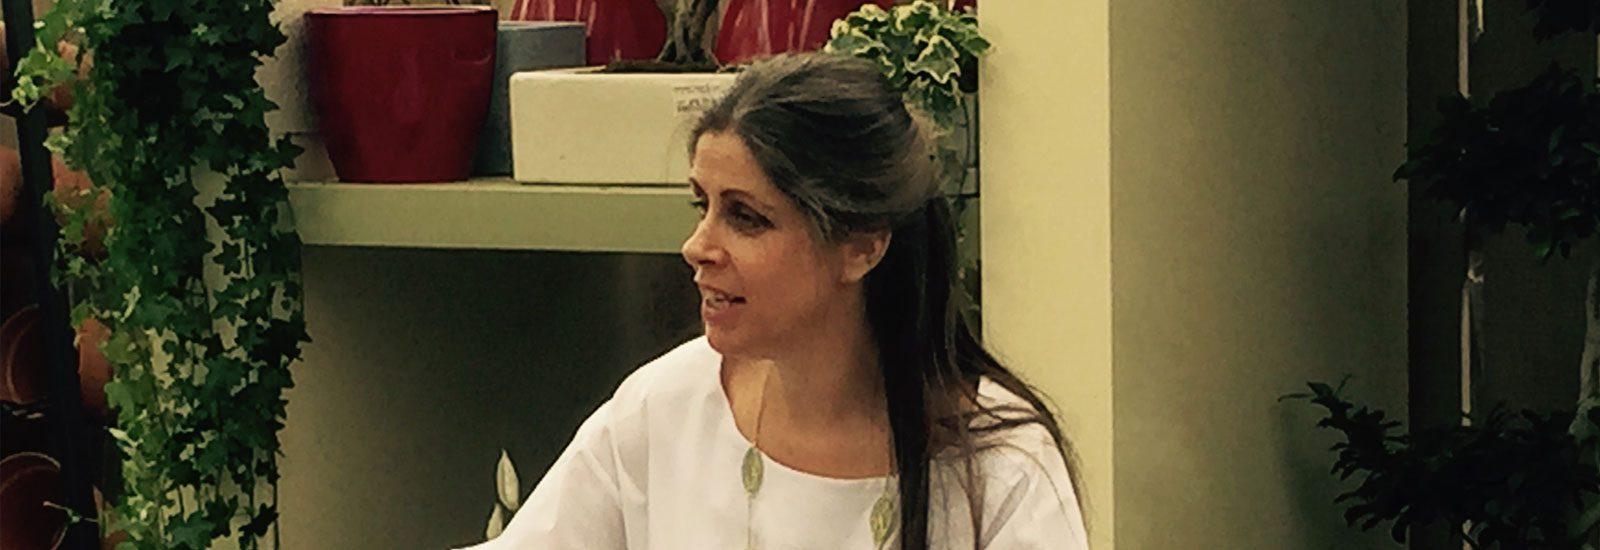 Isobel Jordan herbalist and naturopath